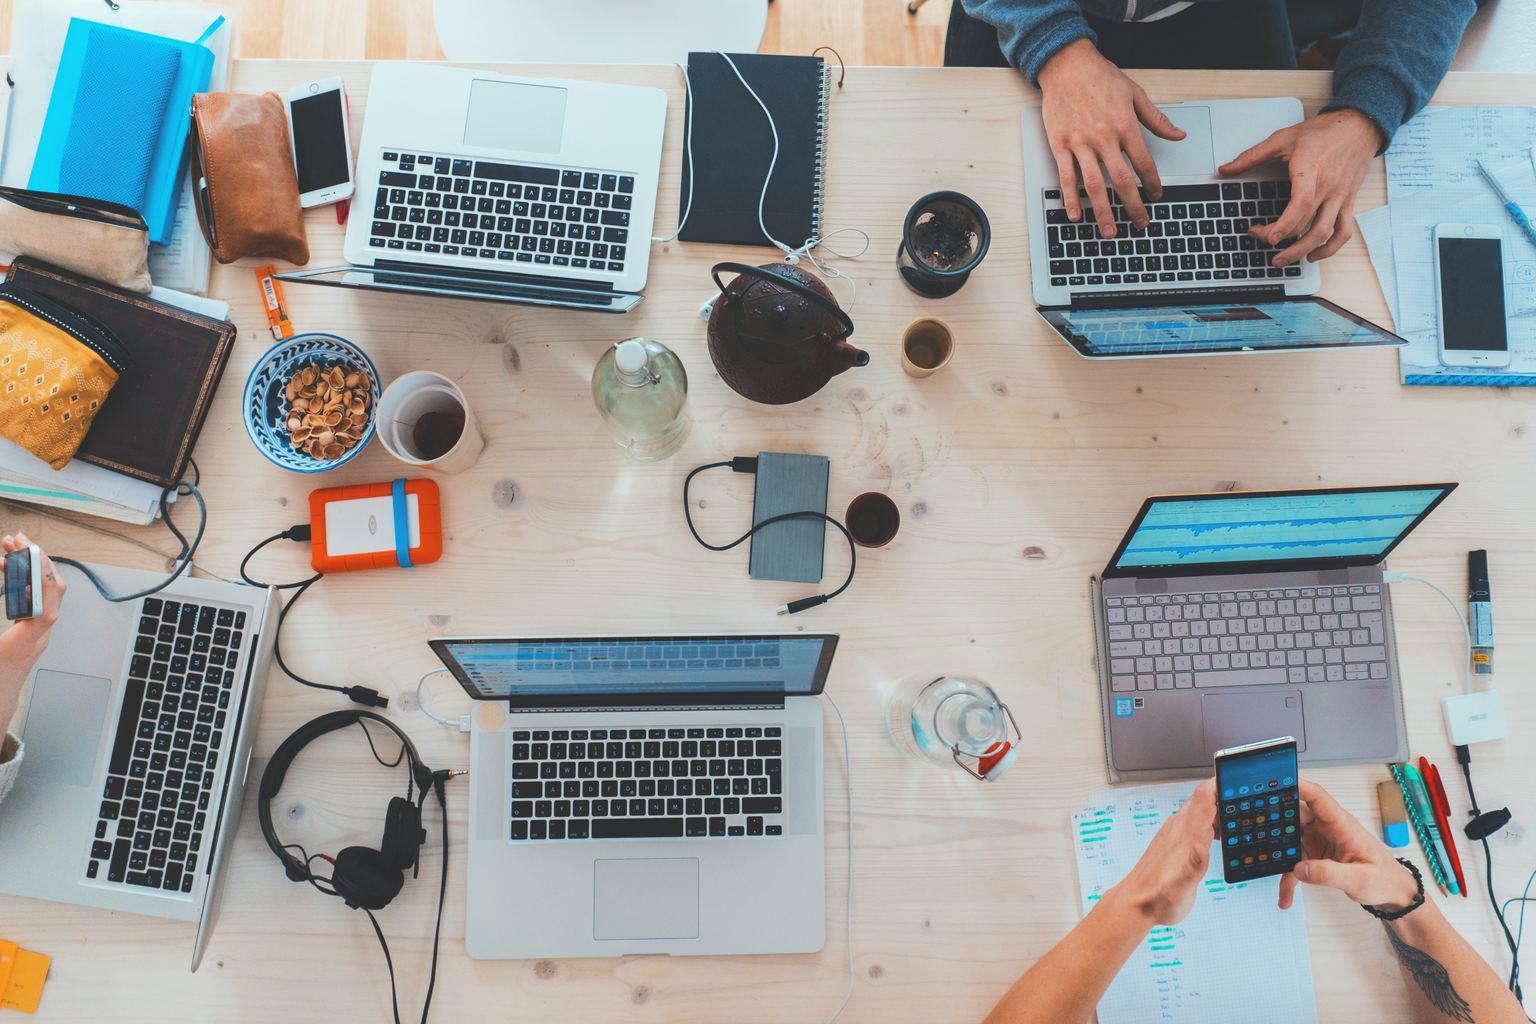 coffeeshop, friends, laptop, studying, work